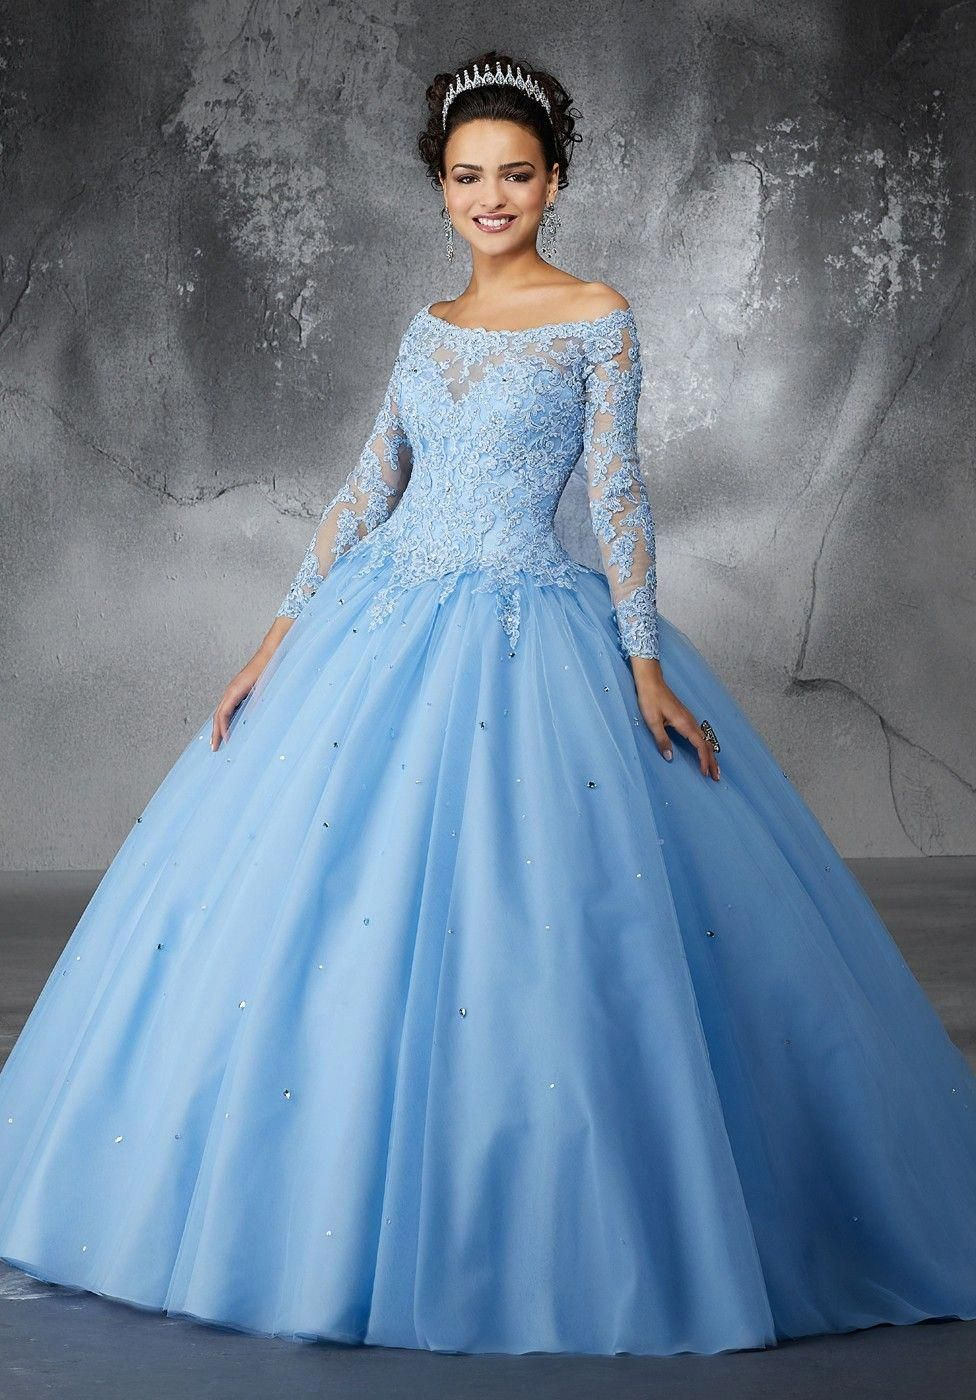 3b95007334e Mori Lee - Dress Style 60052  ModestSkirts Long Sleeve Quinceanera Dresses